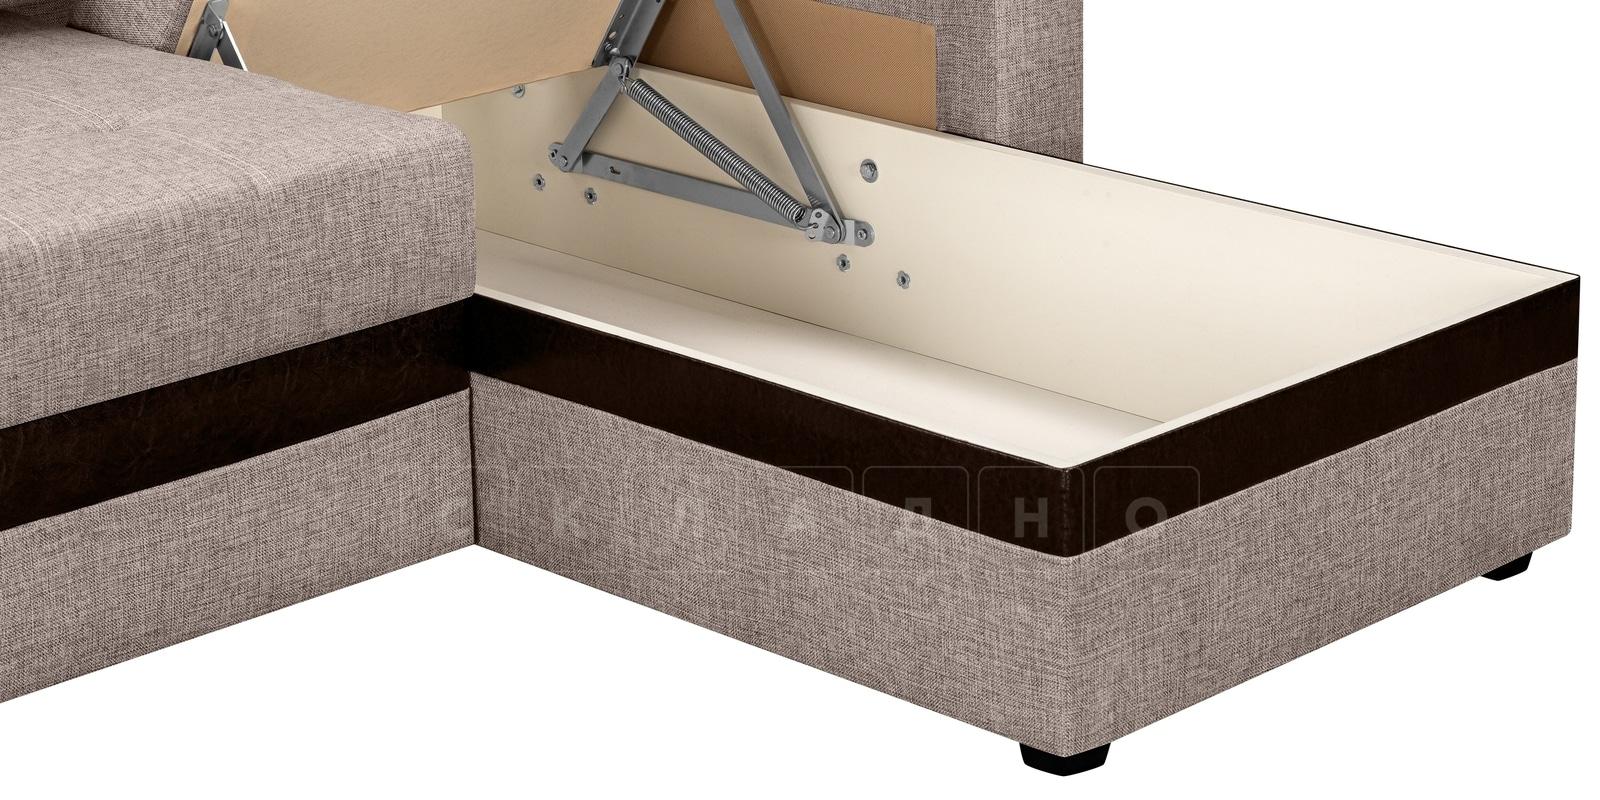 Угловой диван Атланта рогожка темно-бежевого цвета фото 6 | интернет-магазин Складно